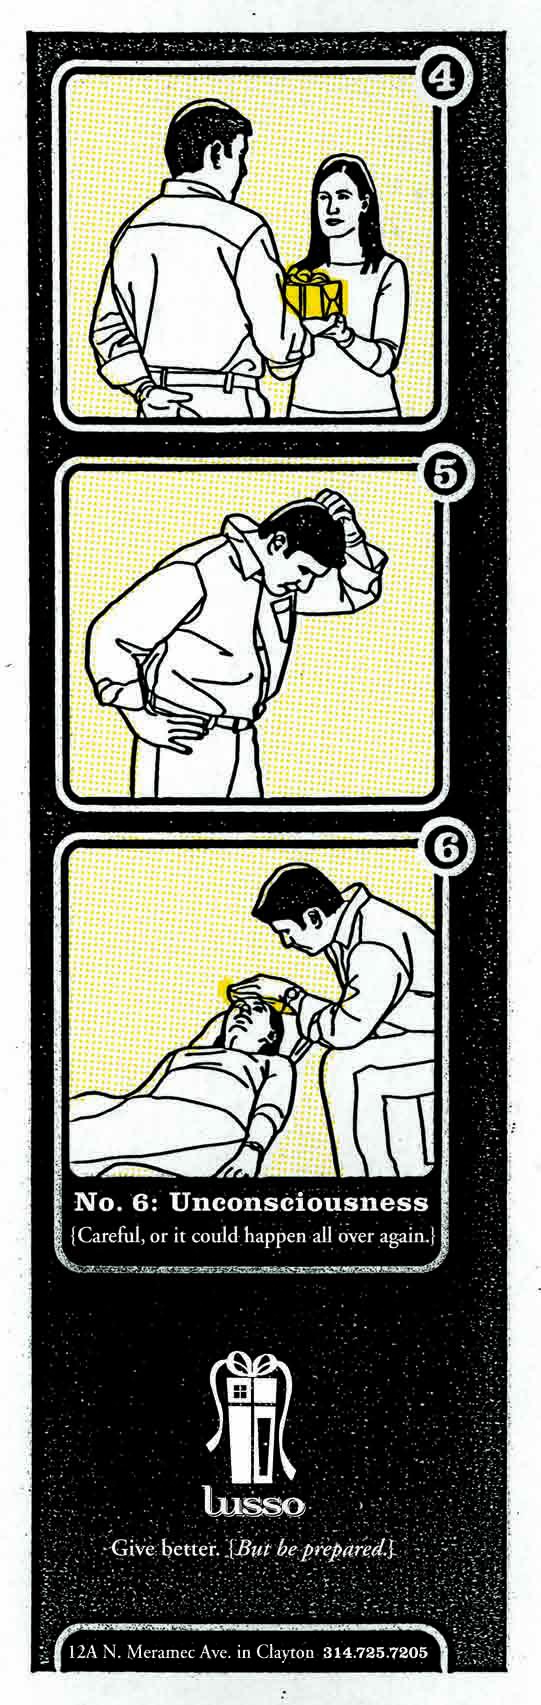 Lusso Ad 3.Yellow.jpg